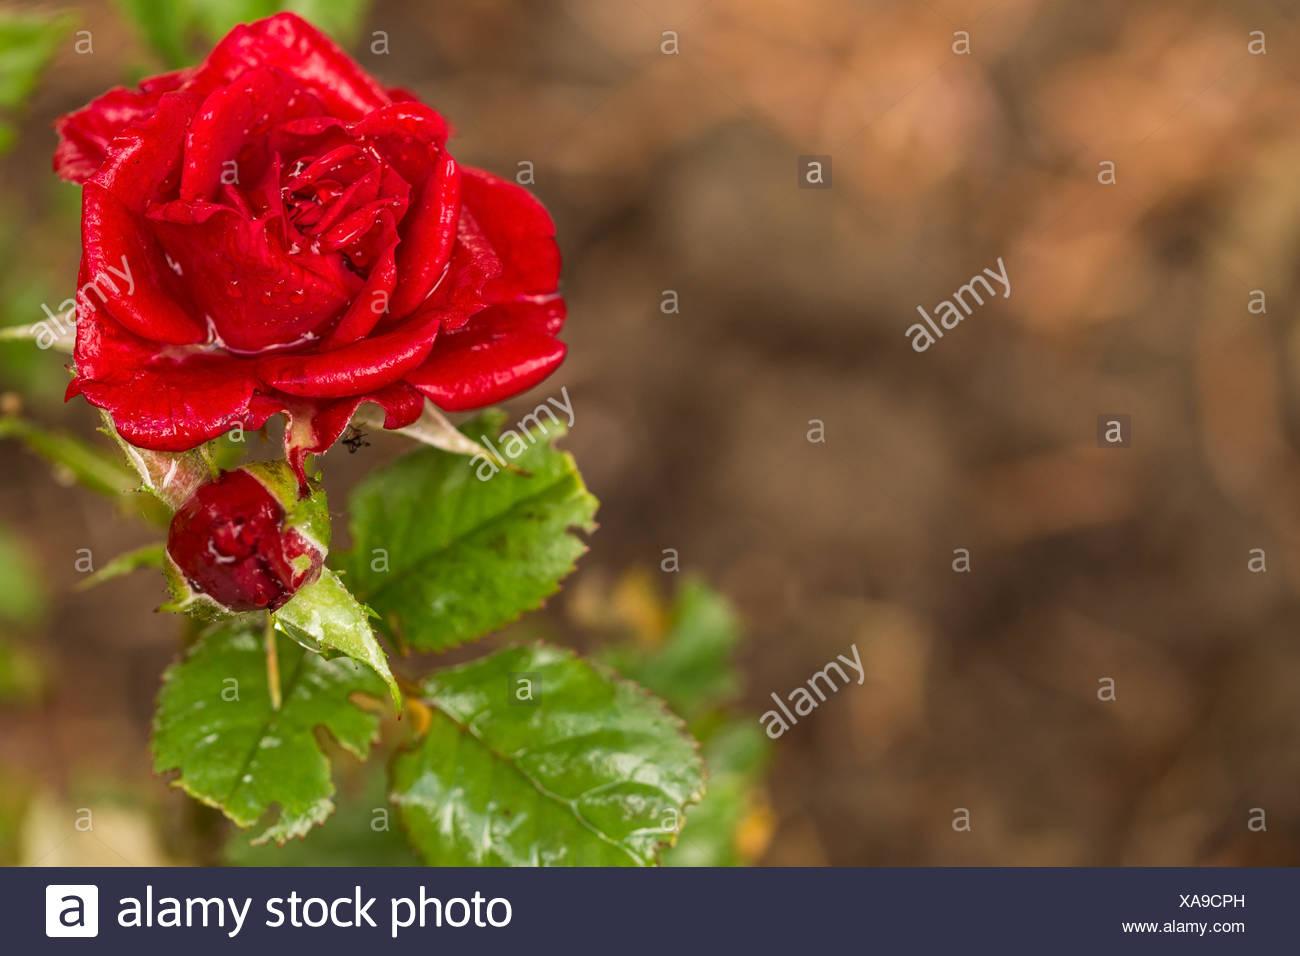 Beautiful red rose stock photo 281720057 alamy beautiful red rose izmirmasajfo